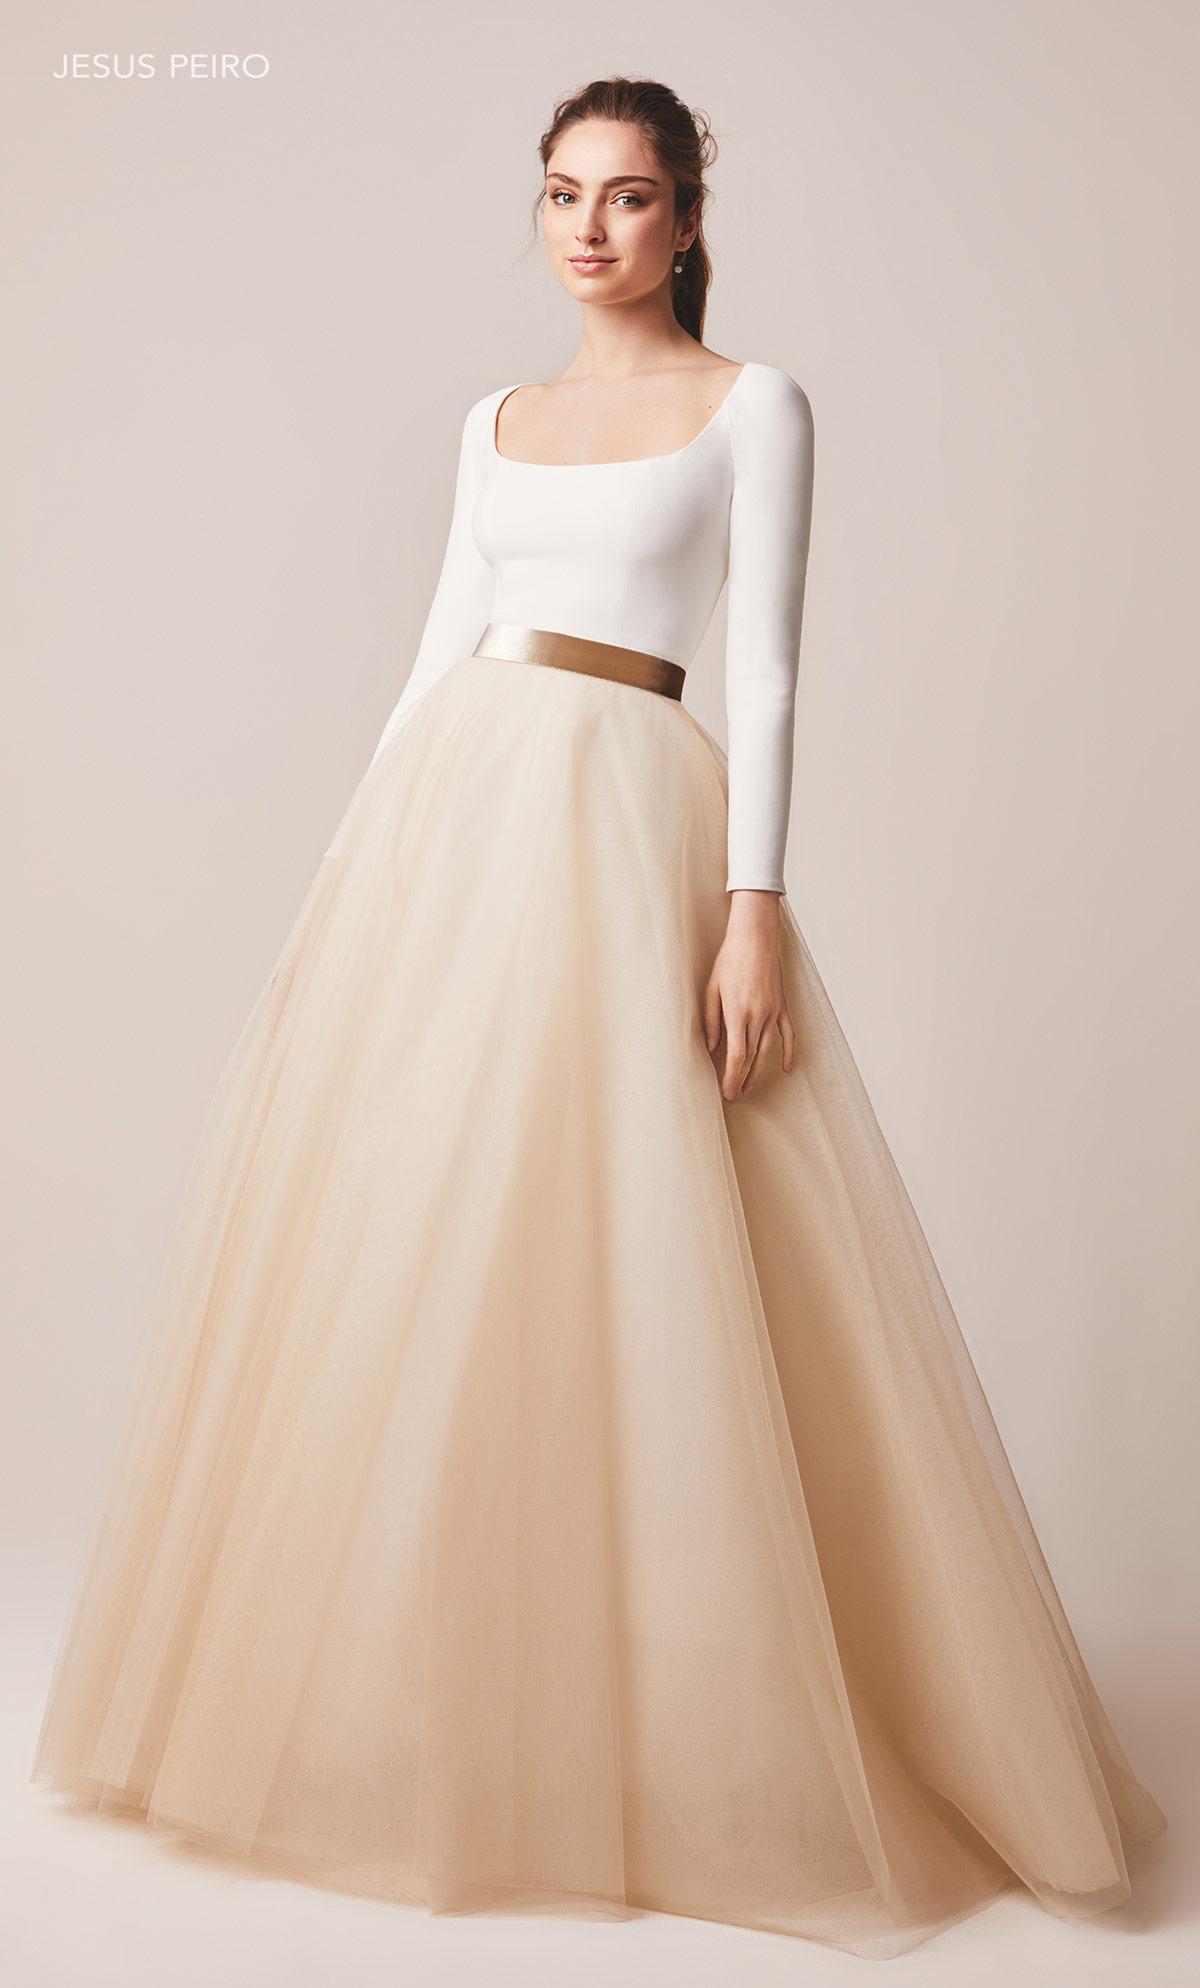 Vestido novia Jesús Peiró Ref.142